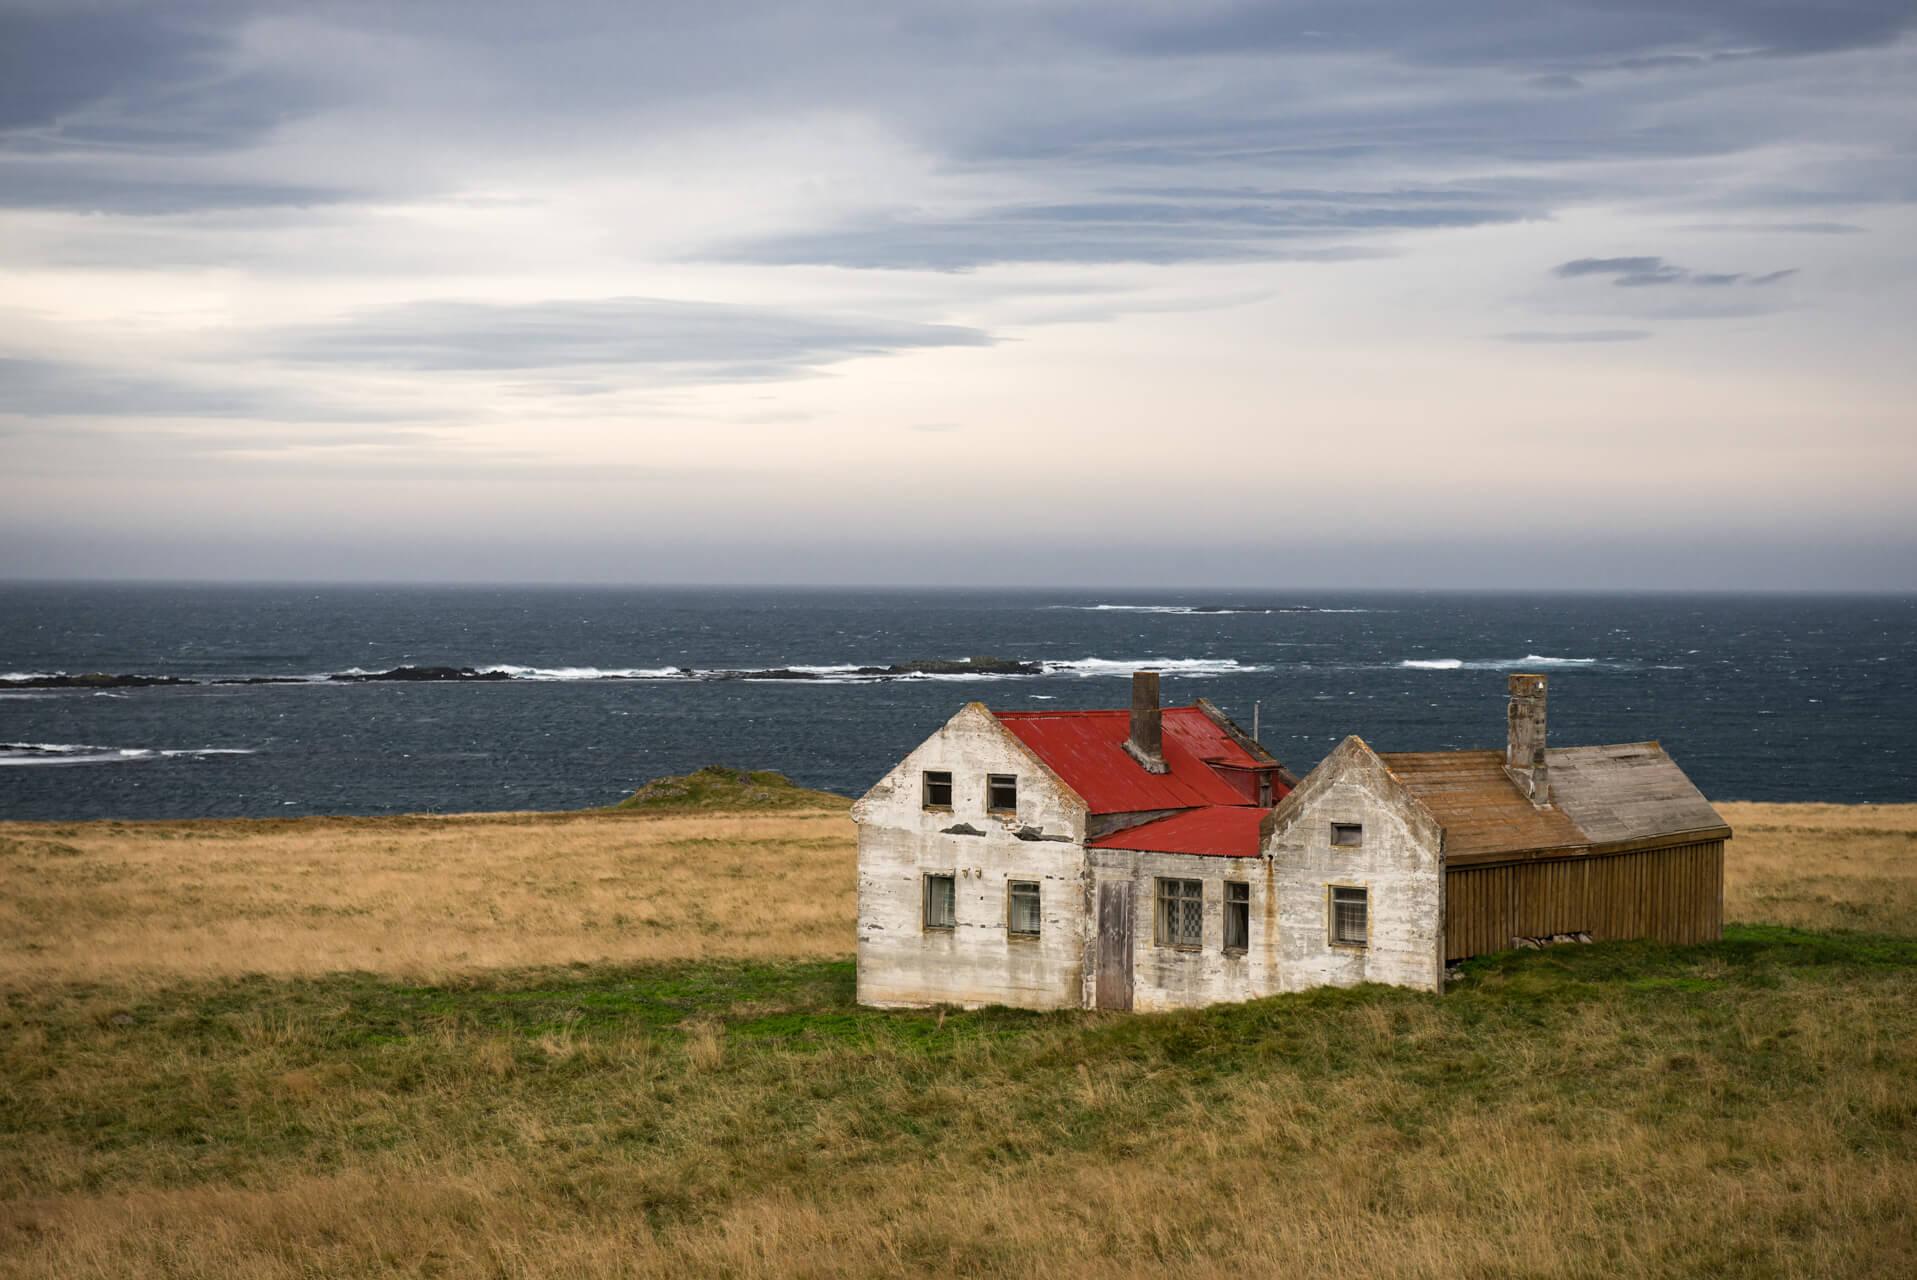 Island, Hindisvík; Fotograf Steffen Lohse